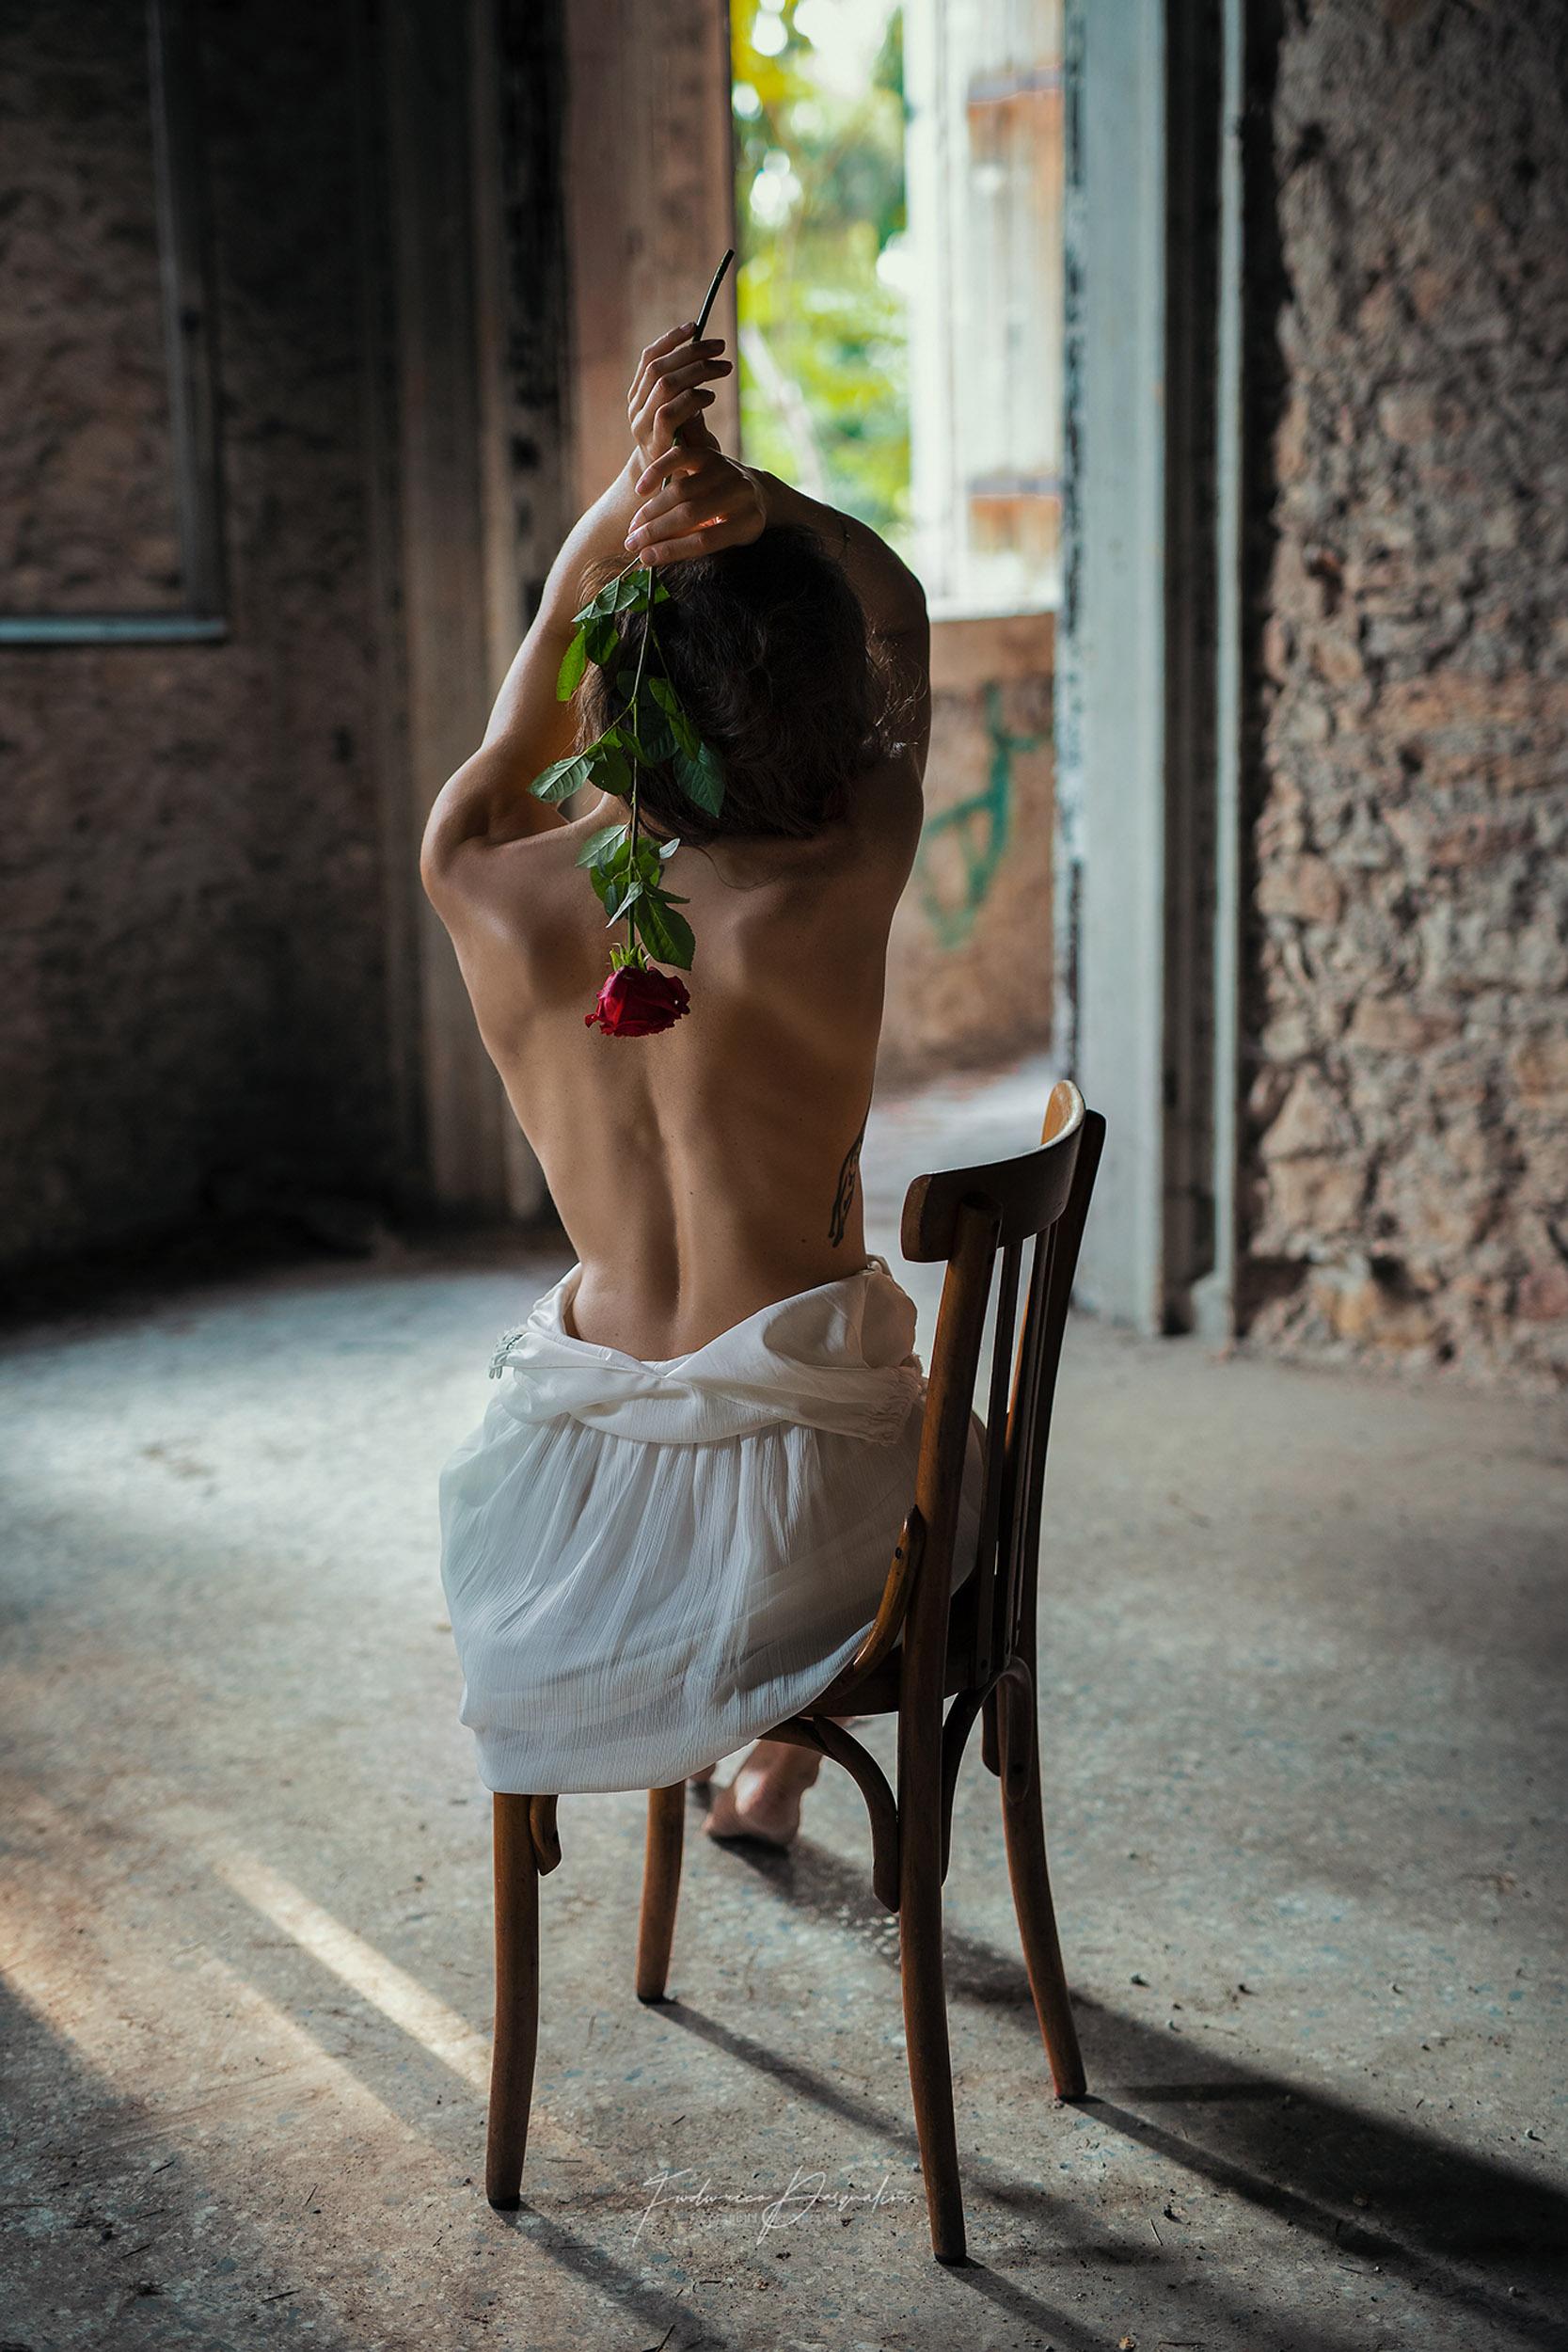 Categorie: Glamour, Portrait, Boudoir & Nude - Ph: FEDERICO PASQUALINI - Model: CHIARA PASSION PHOTO - Location: Vicenza, VI, Italia